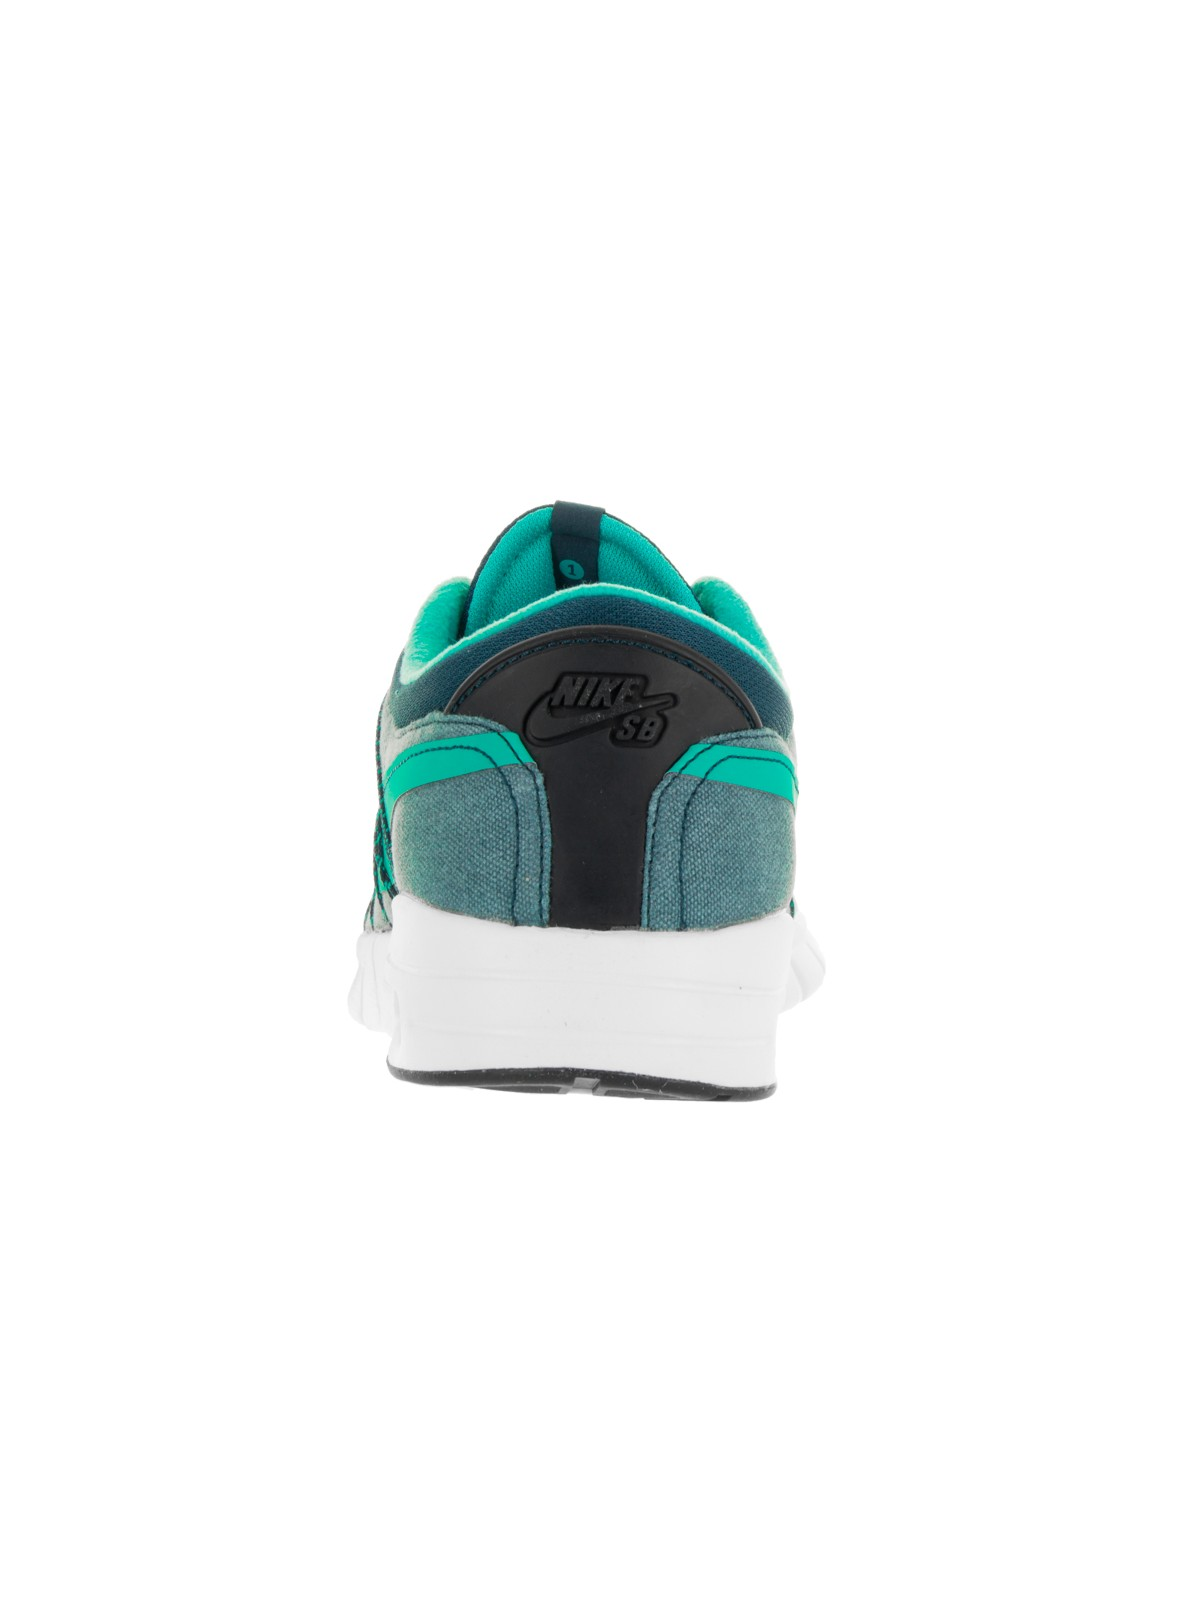 Nike Men's Koston Max Skate Shoe